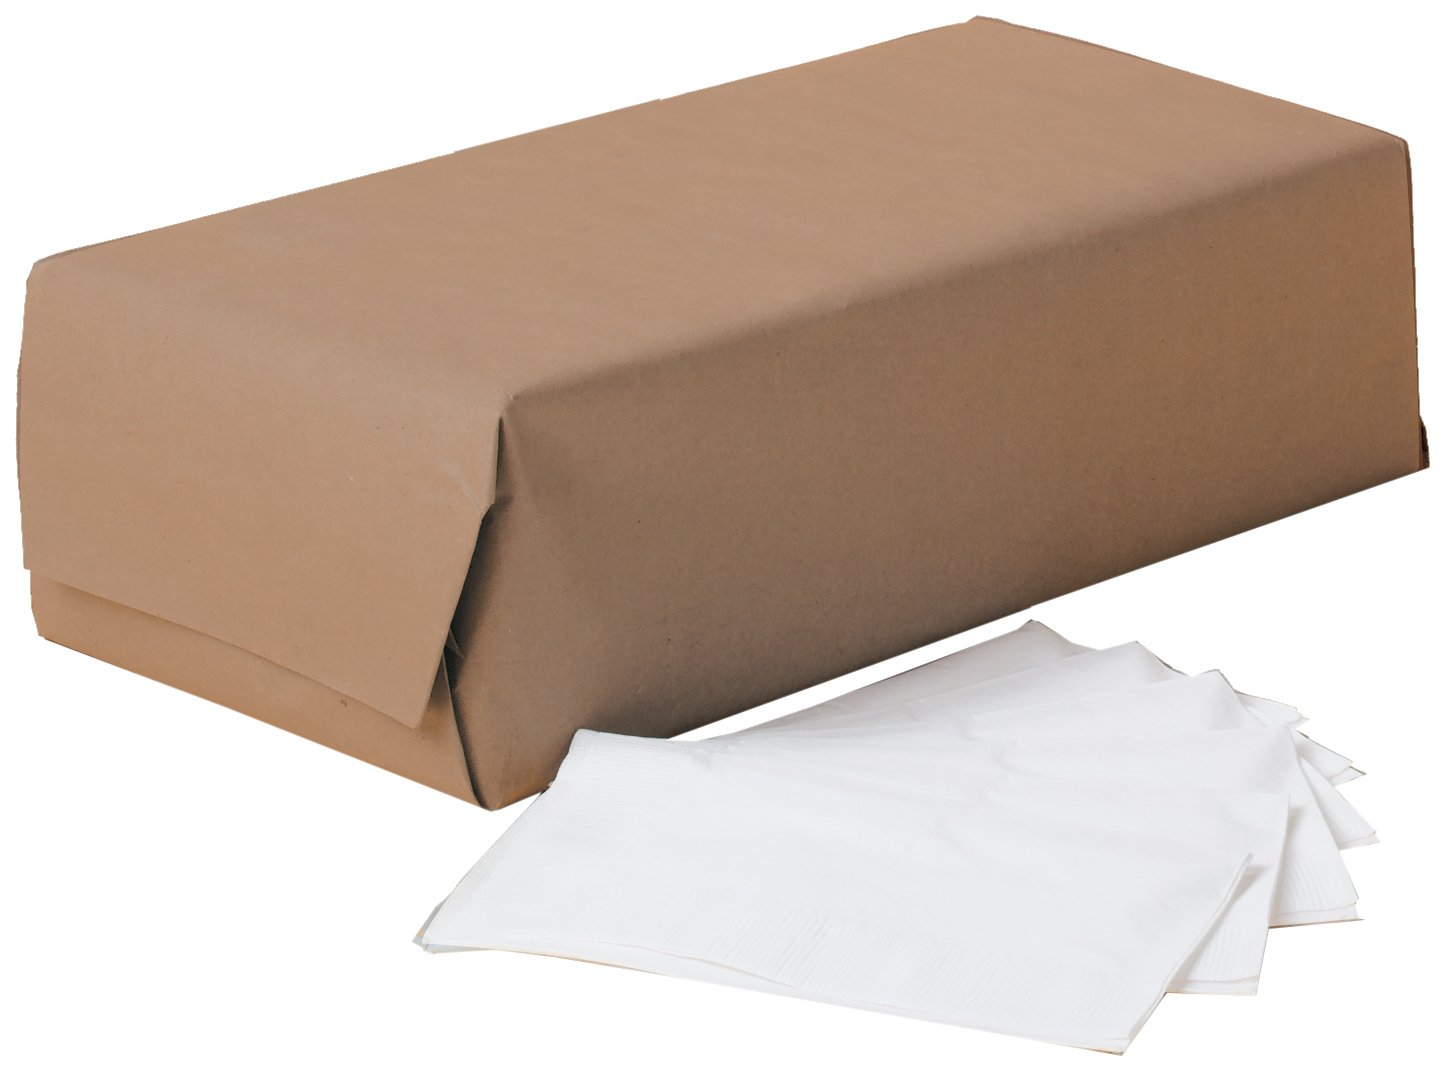 KimberlyClark Professional 98200 Scott 1/8 Fold Dinner Napkins 2 Ply White by Kimberly-Clark Professional (Image #2)